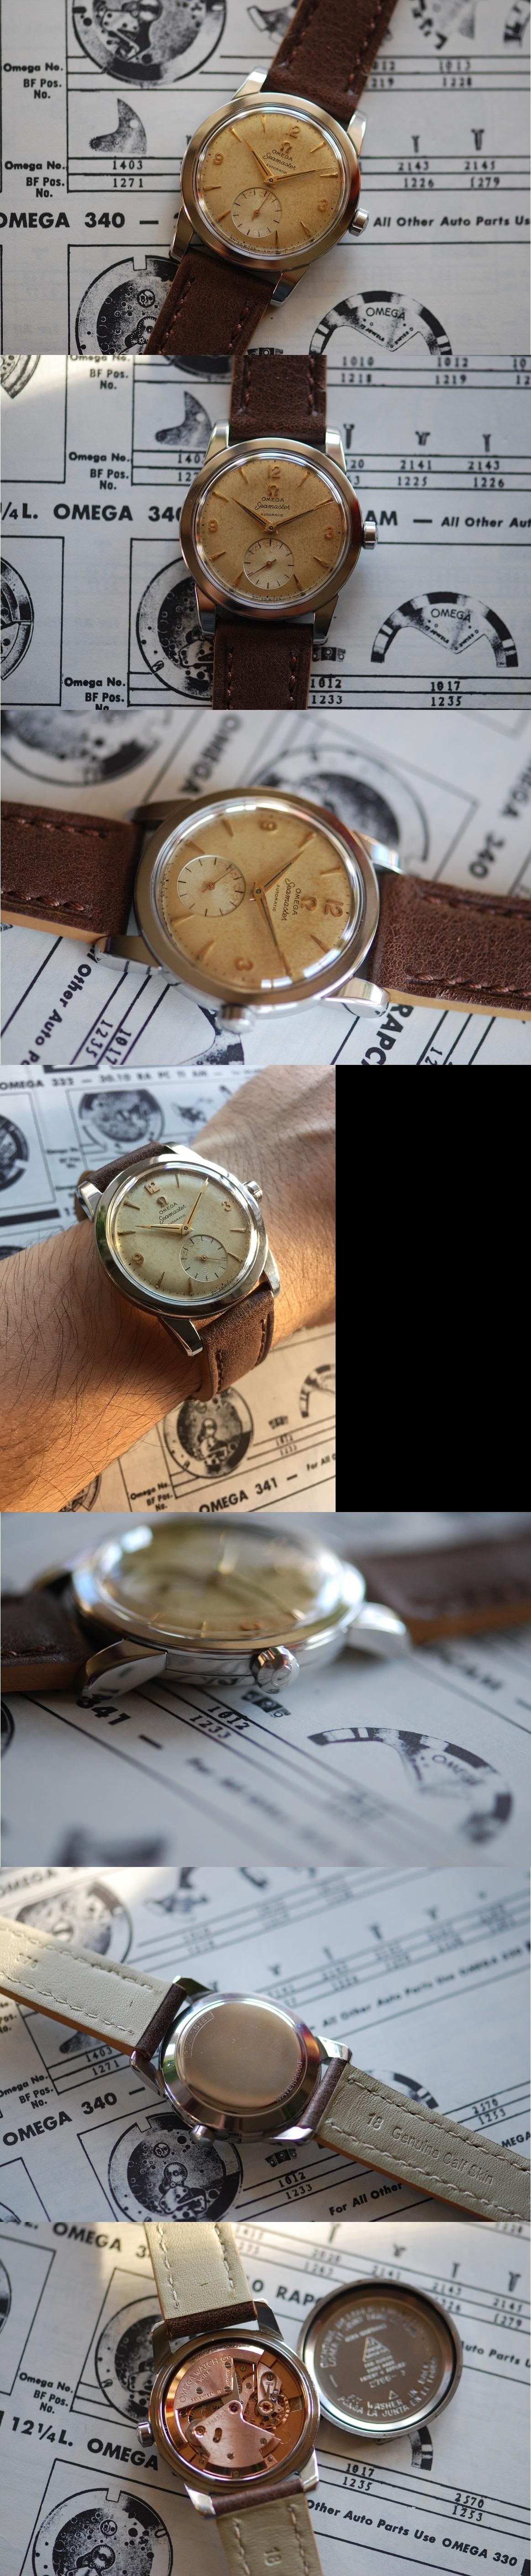 1954 Omega Seamaster Sub Sec Automatic Vintage Gent's Watch Vintage